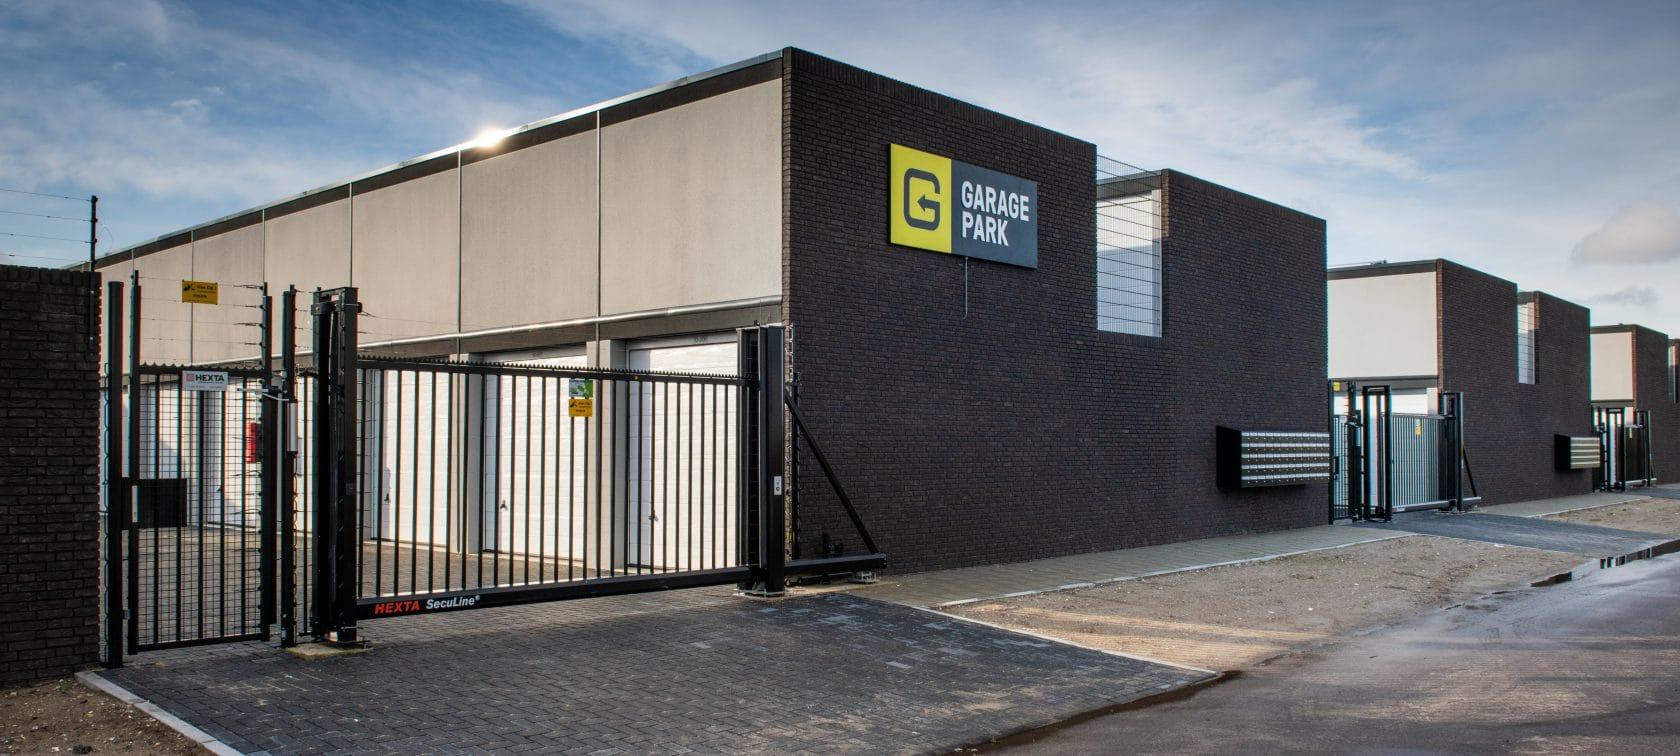 GaragePark Rotterdam Hordijk 1